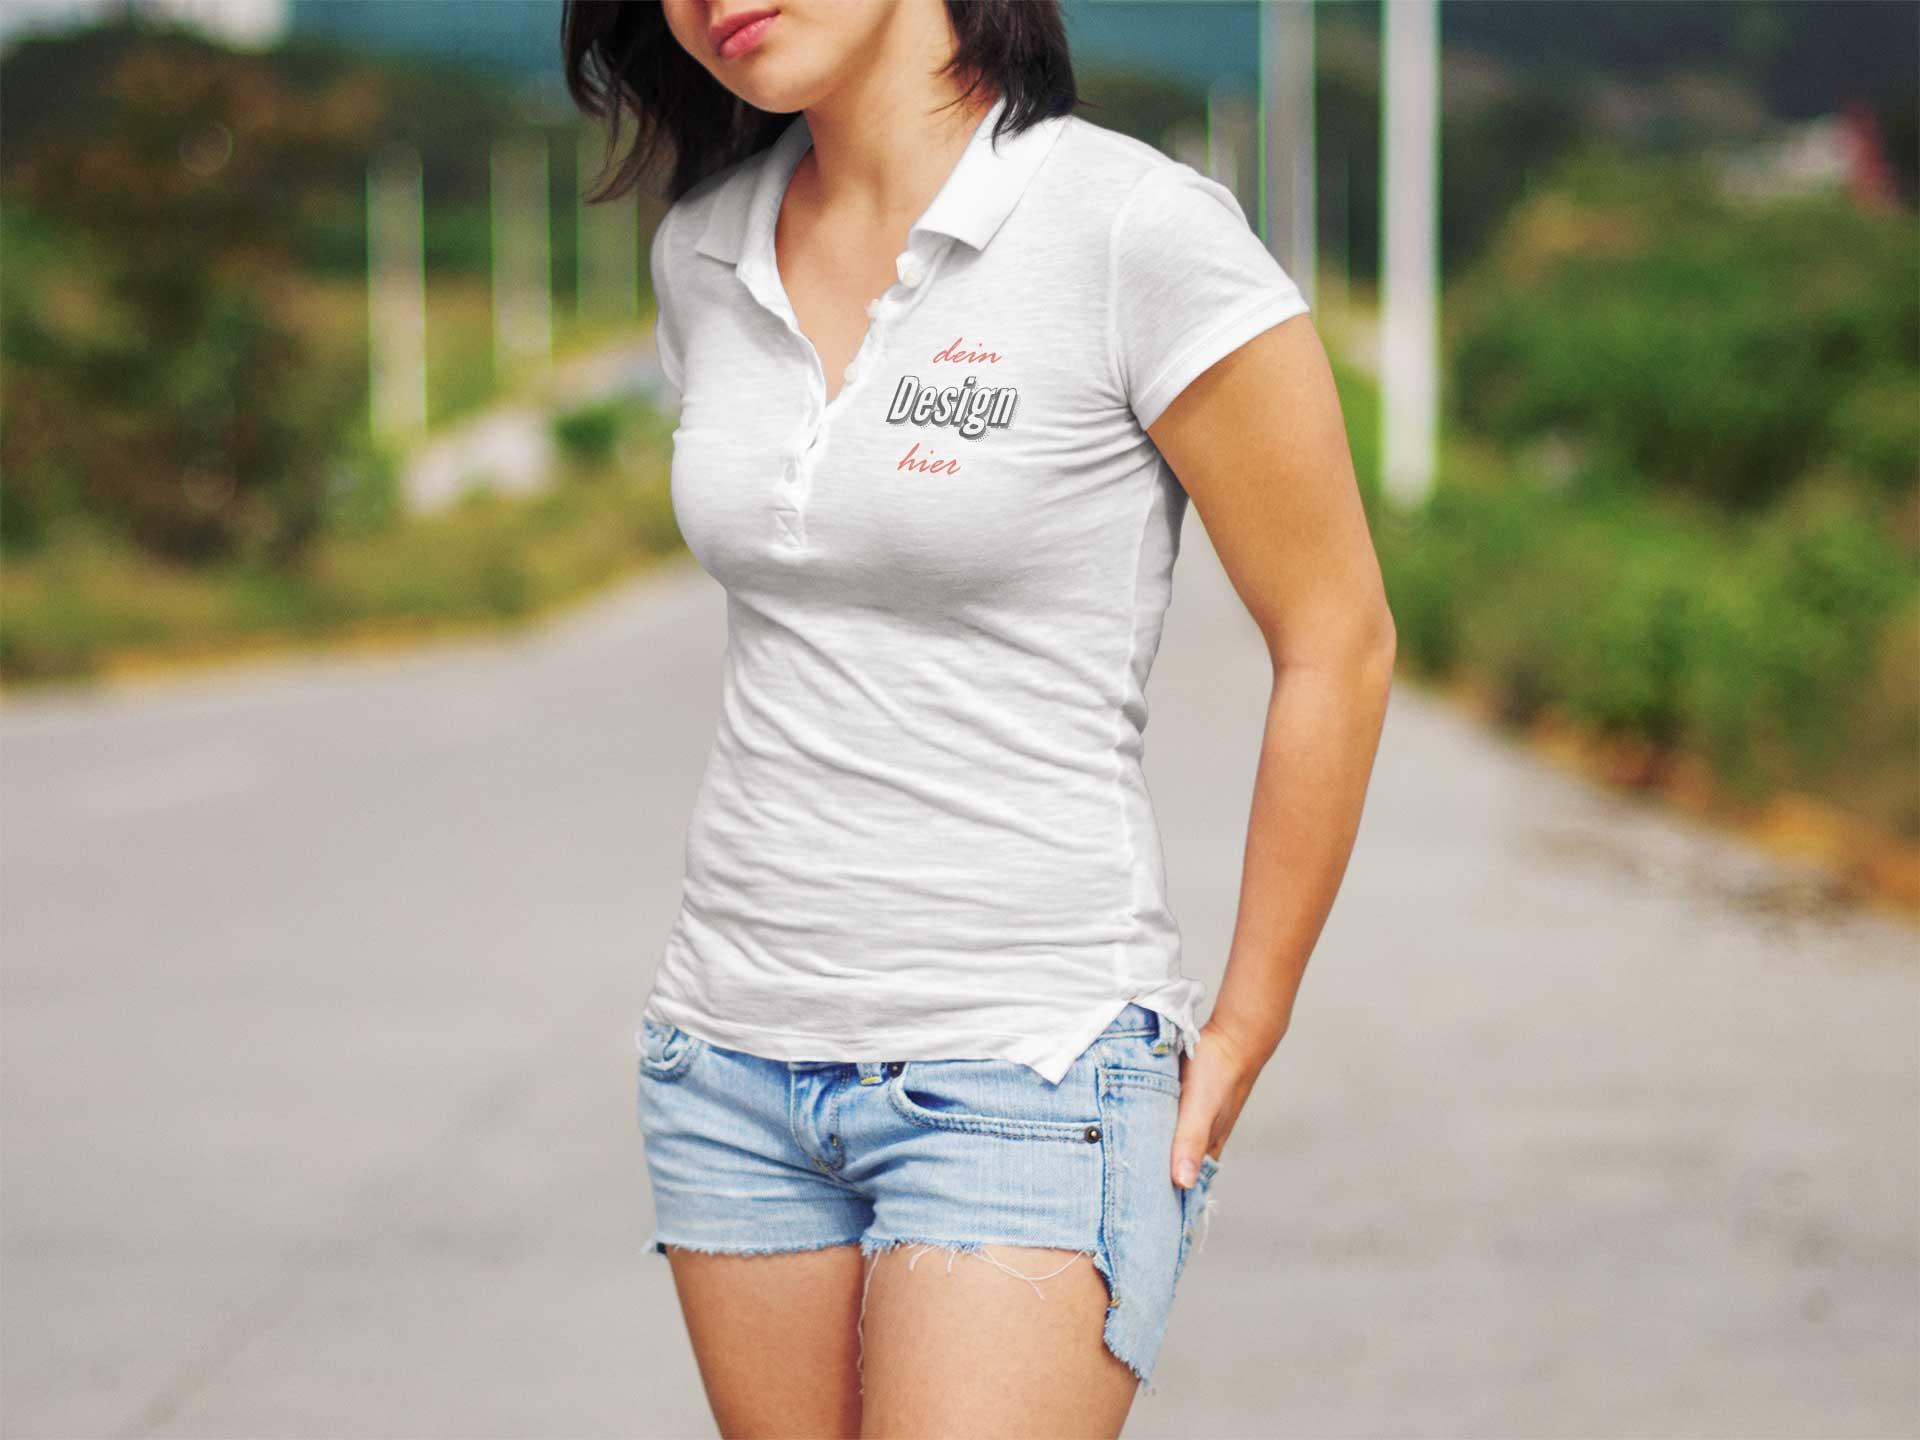 Poloshirt bedrucken Teefarm Schweiz